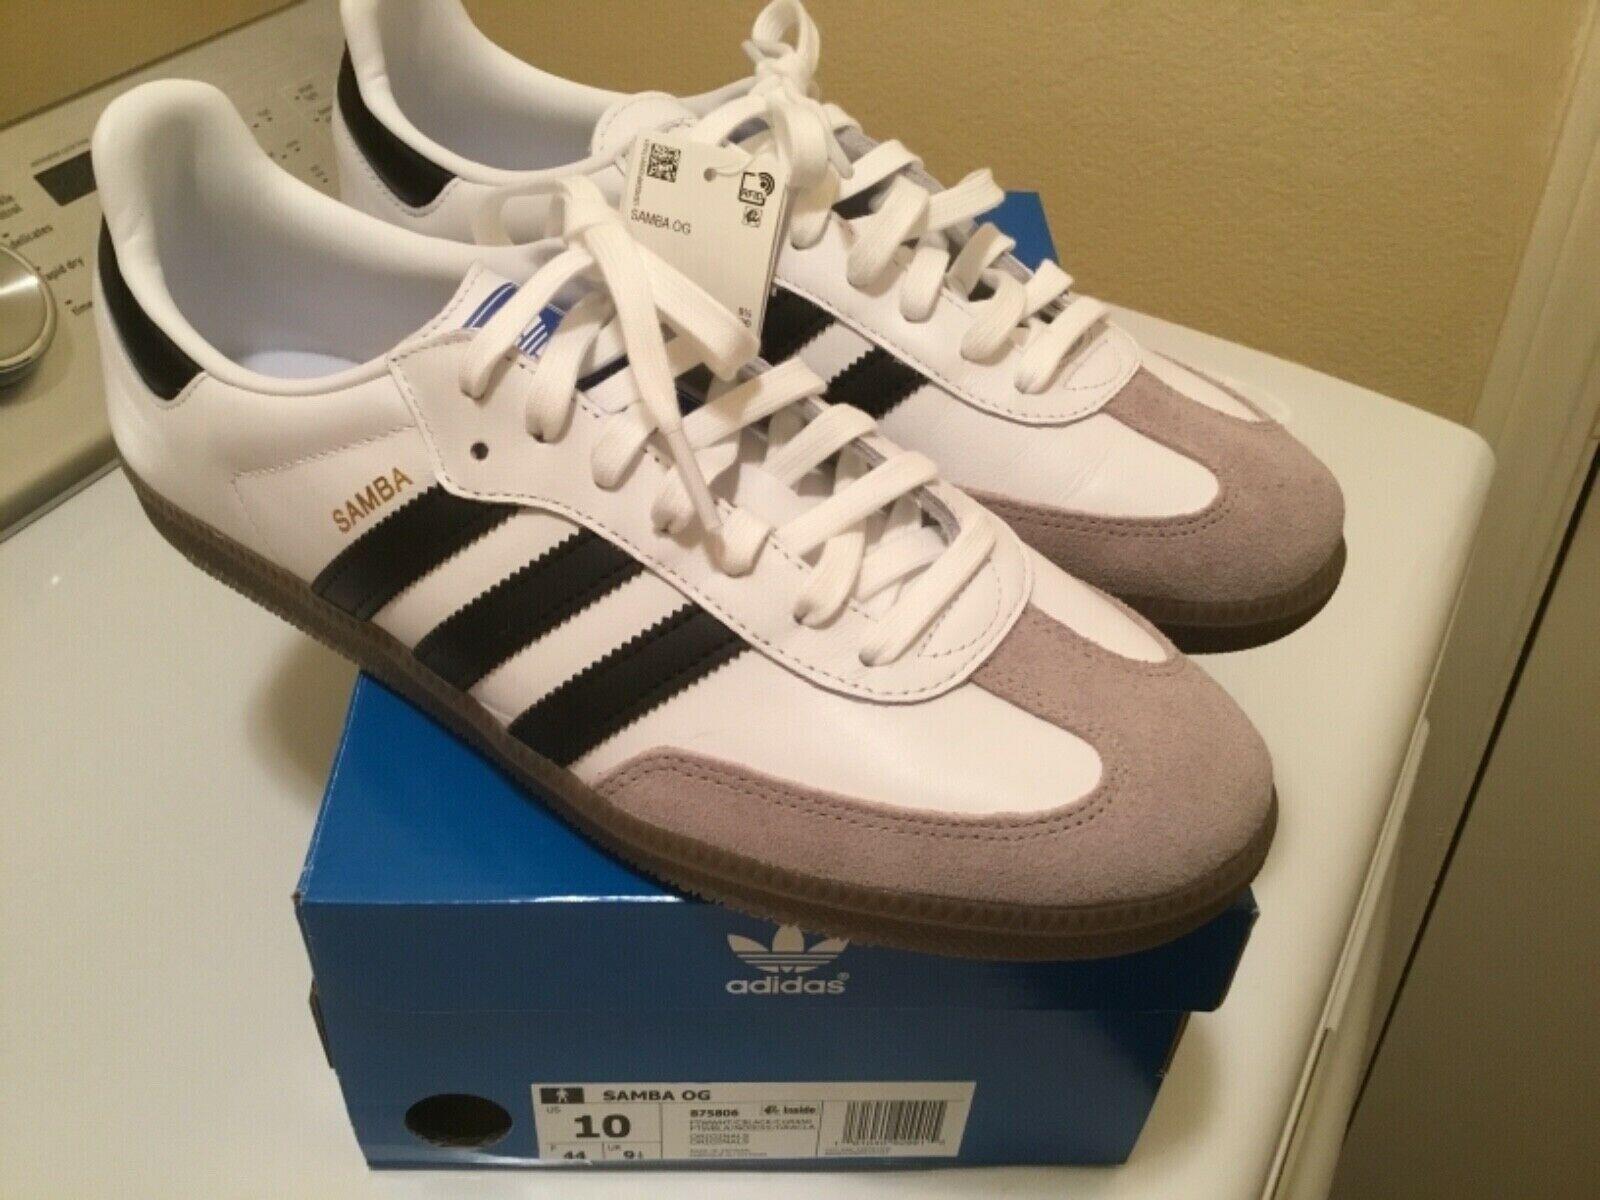 b2bedd5c921 (B75806) Men s Adidas Originals Samba OG shoes Cloud White NEW ...